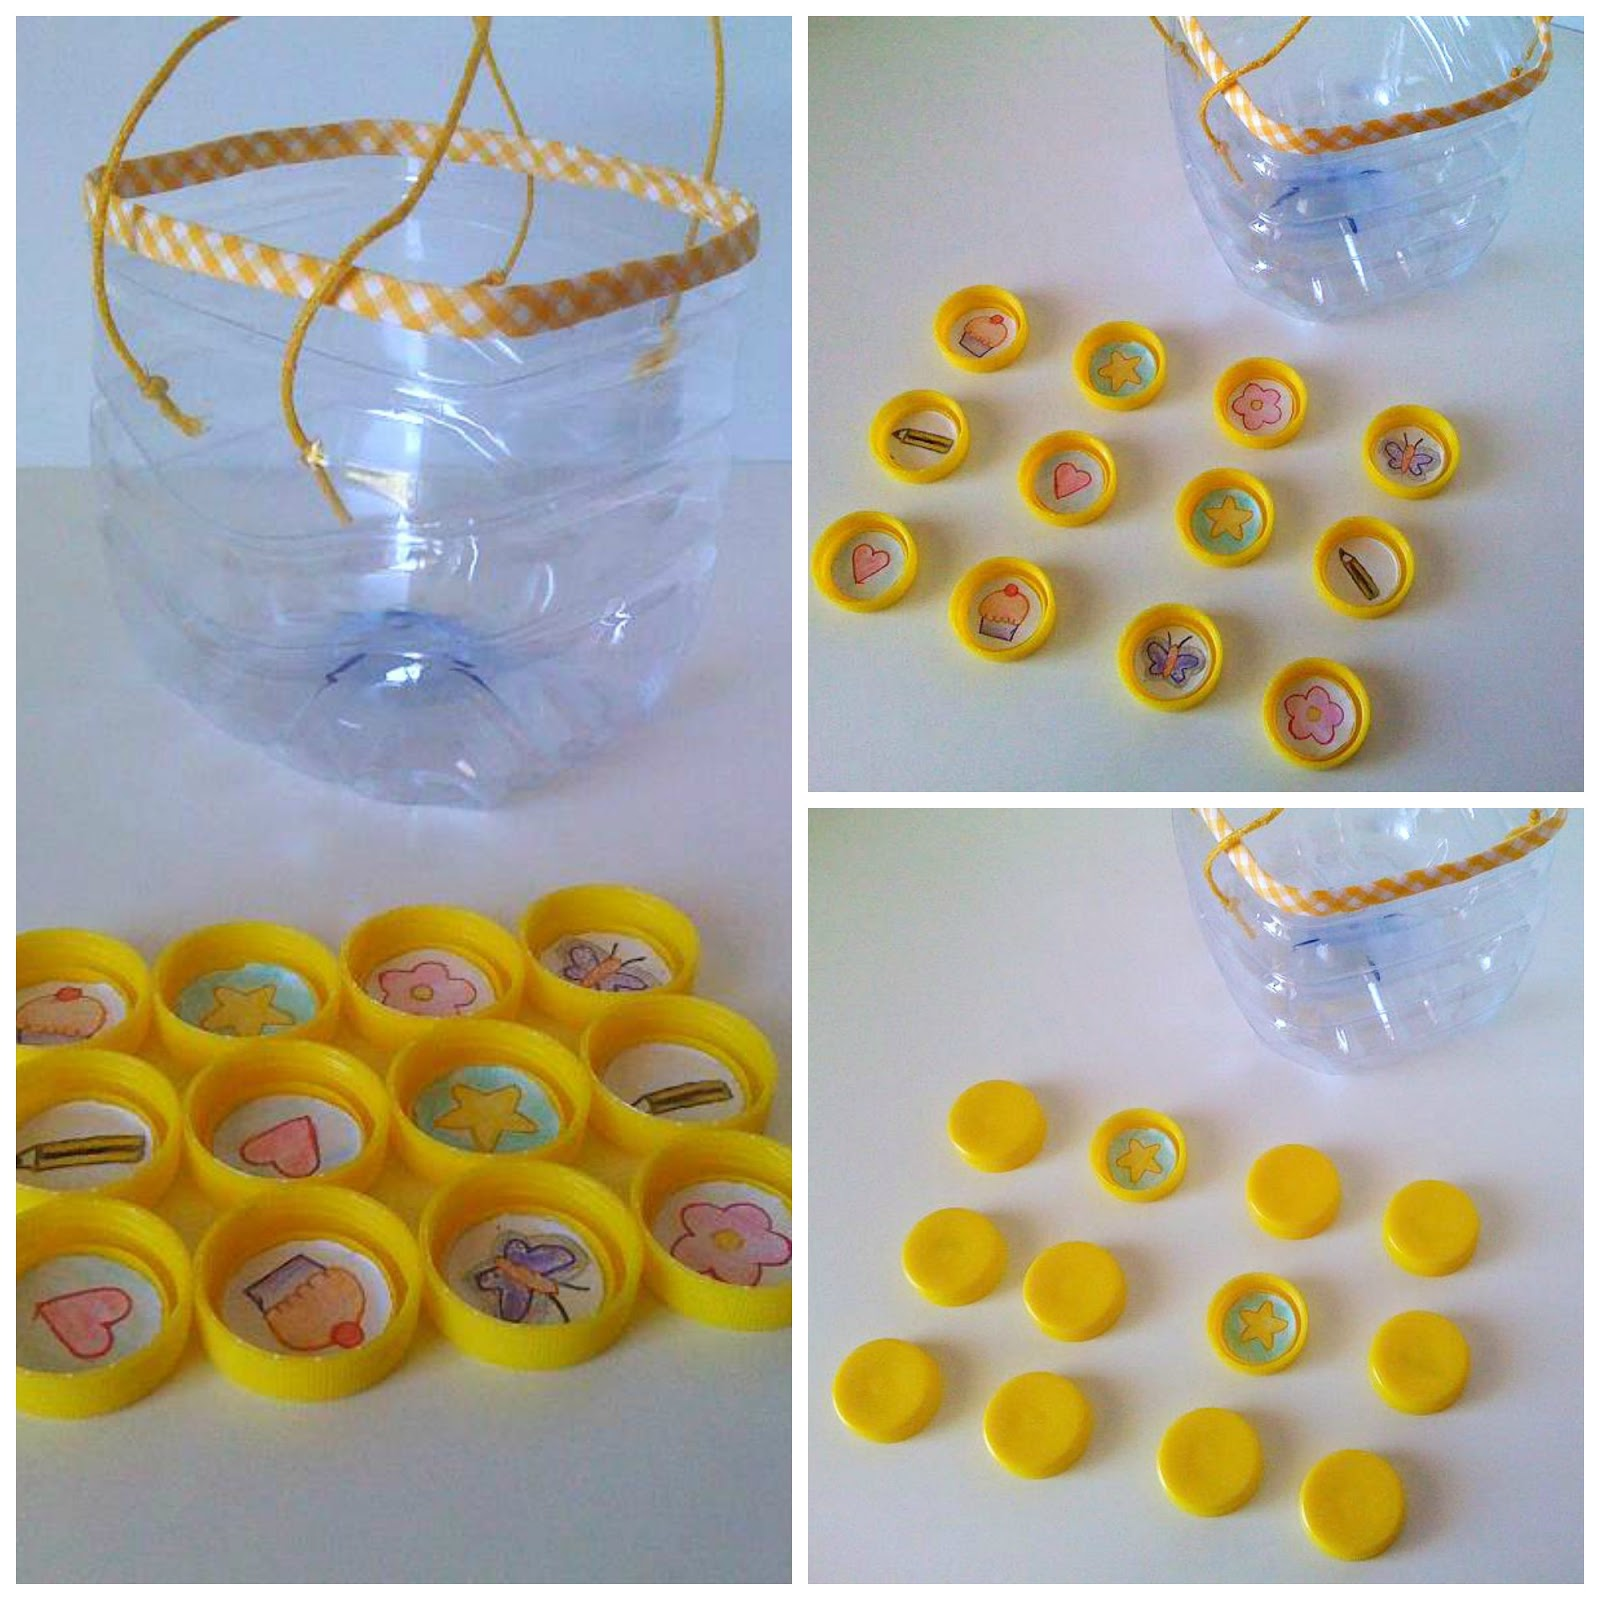 http://4.bp.blogspot.com/-REOm0cEjEfY/UWKZIyXqprI/AAAAAAAACQQ/Pe2nLdJcEc4/s1600/Memory+game+yellow+Collage.jpg